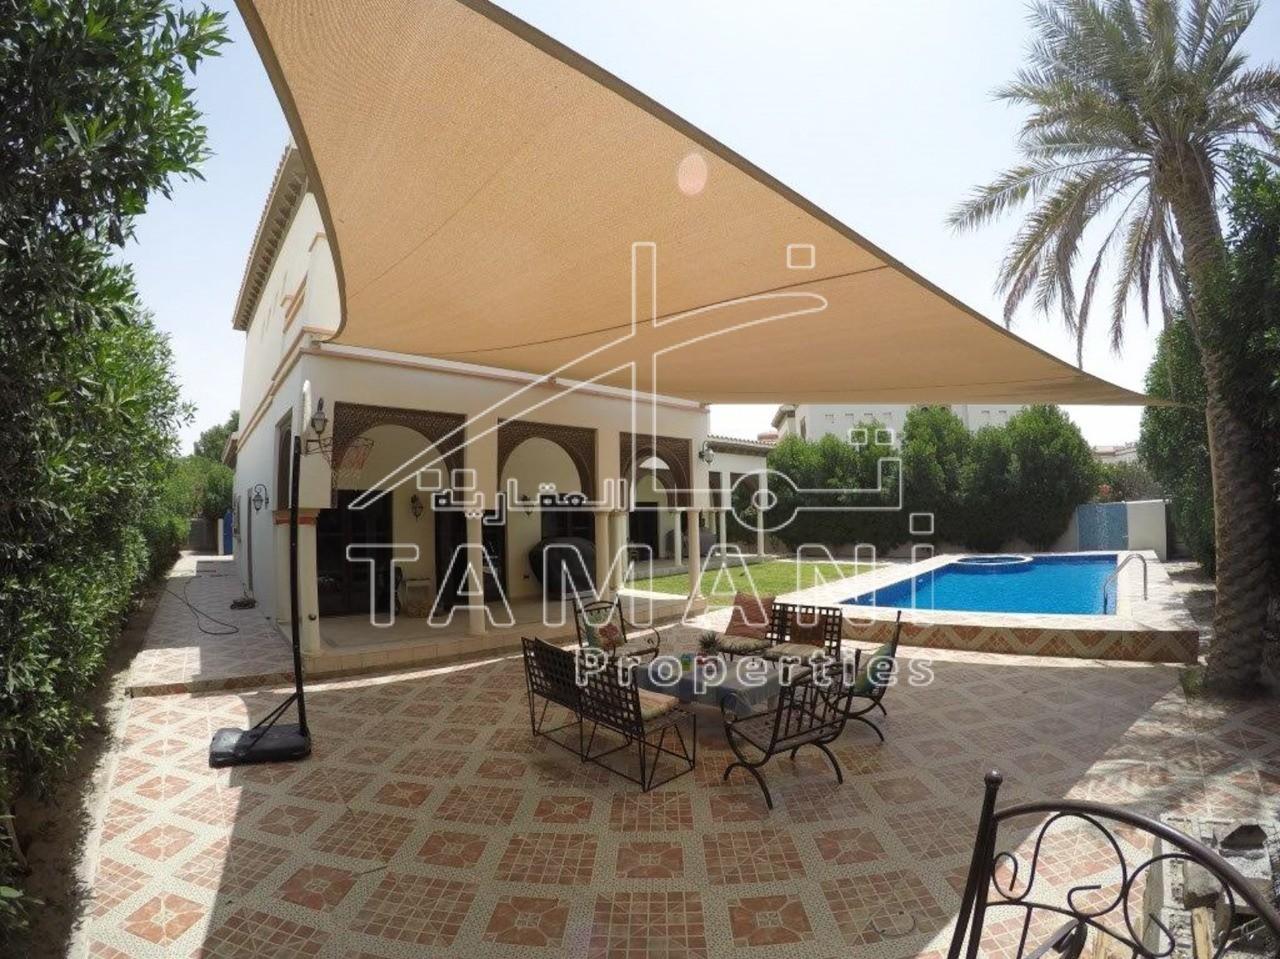 9700 Sq ft Plot |Upgraded Granada | Pool - Ponderosa